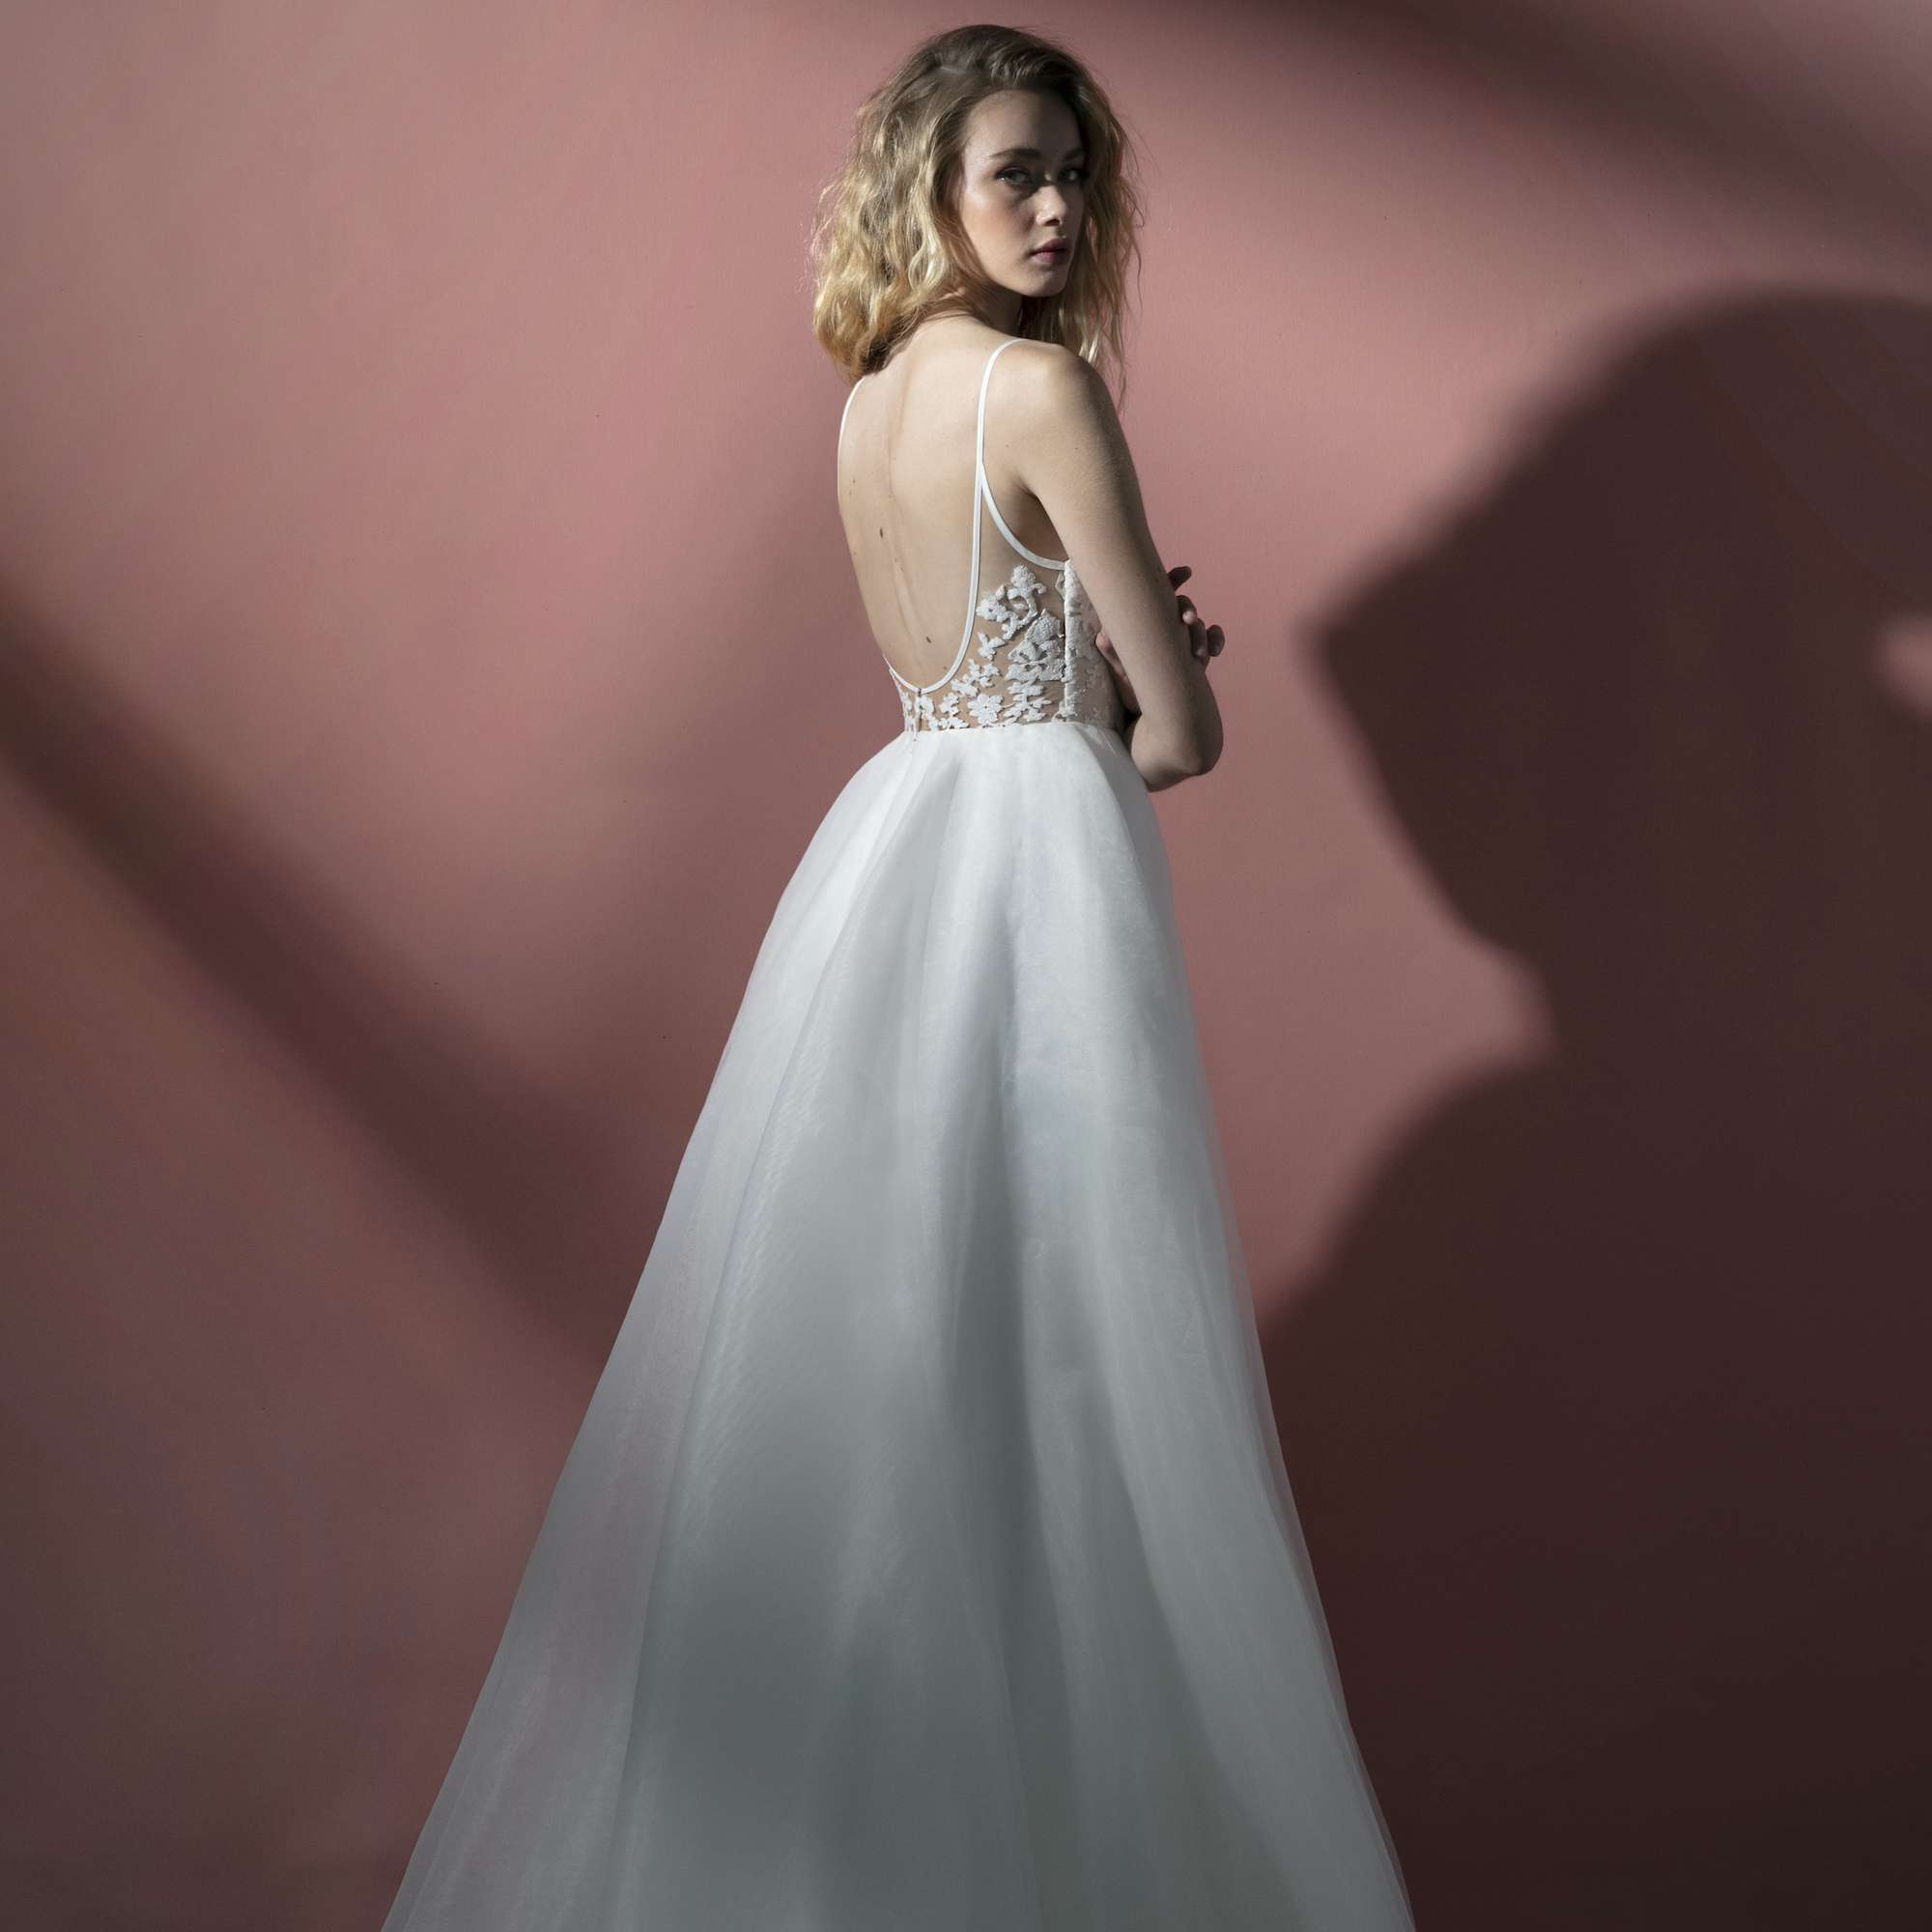 Deja low back wedding dress